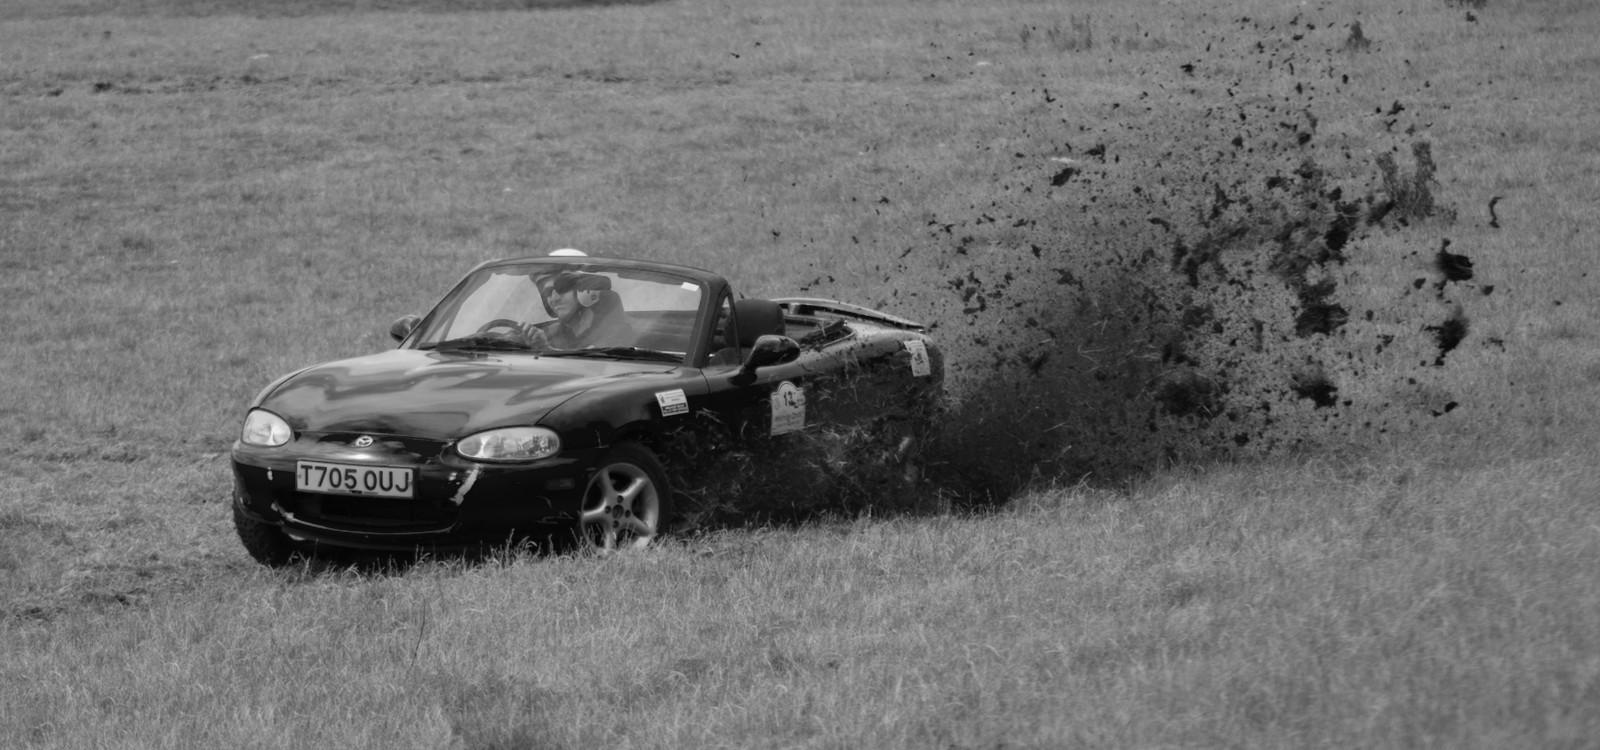 Throwing Up Dirt - J Harkness